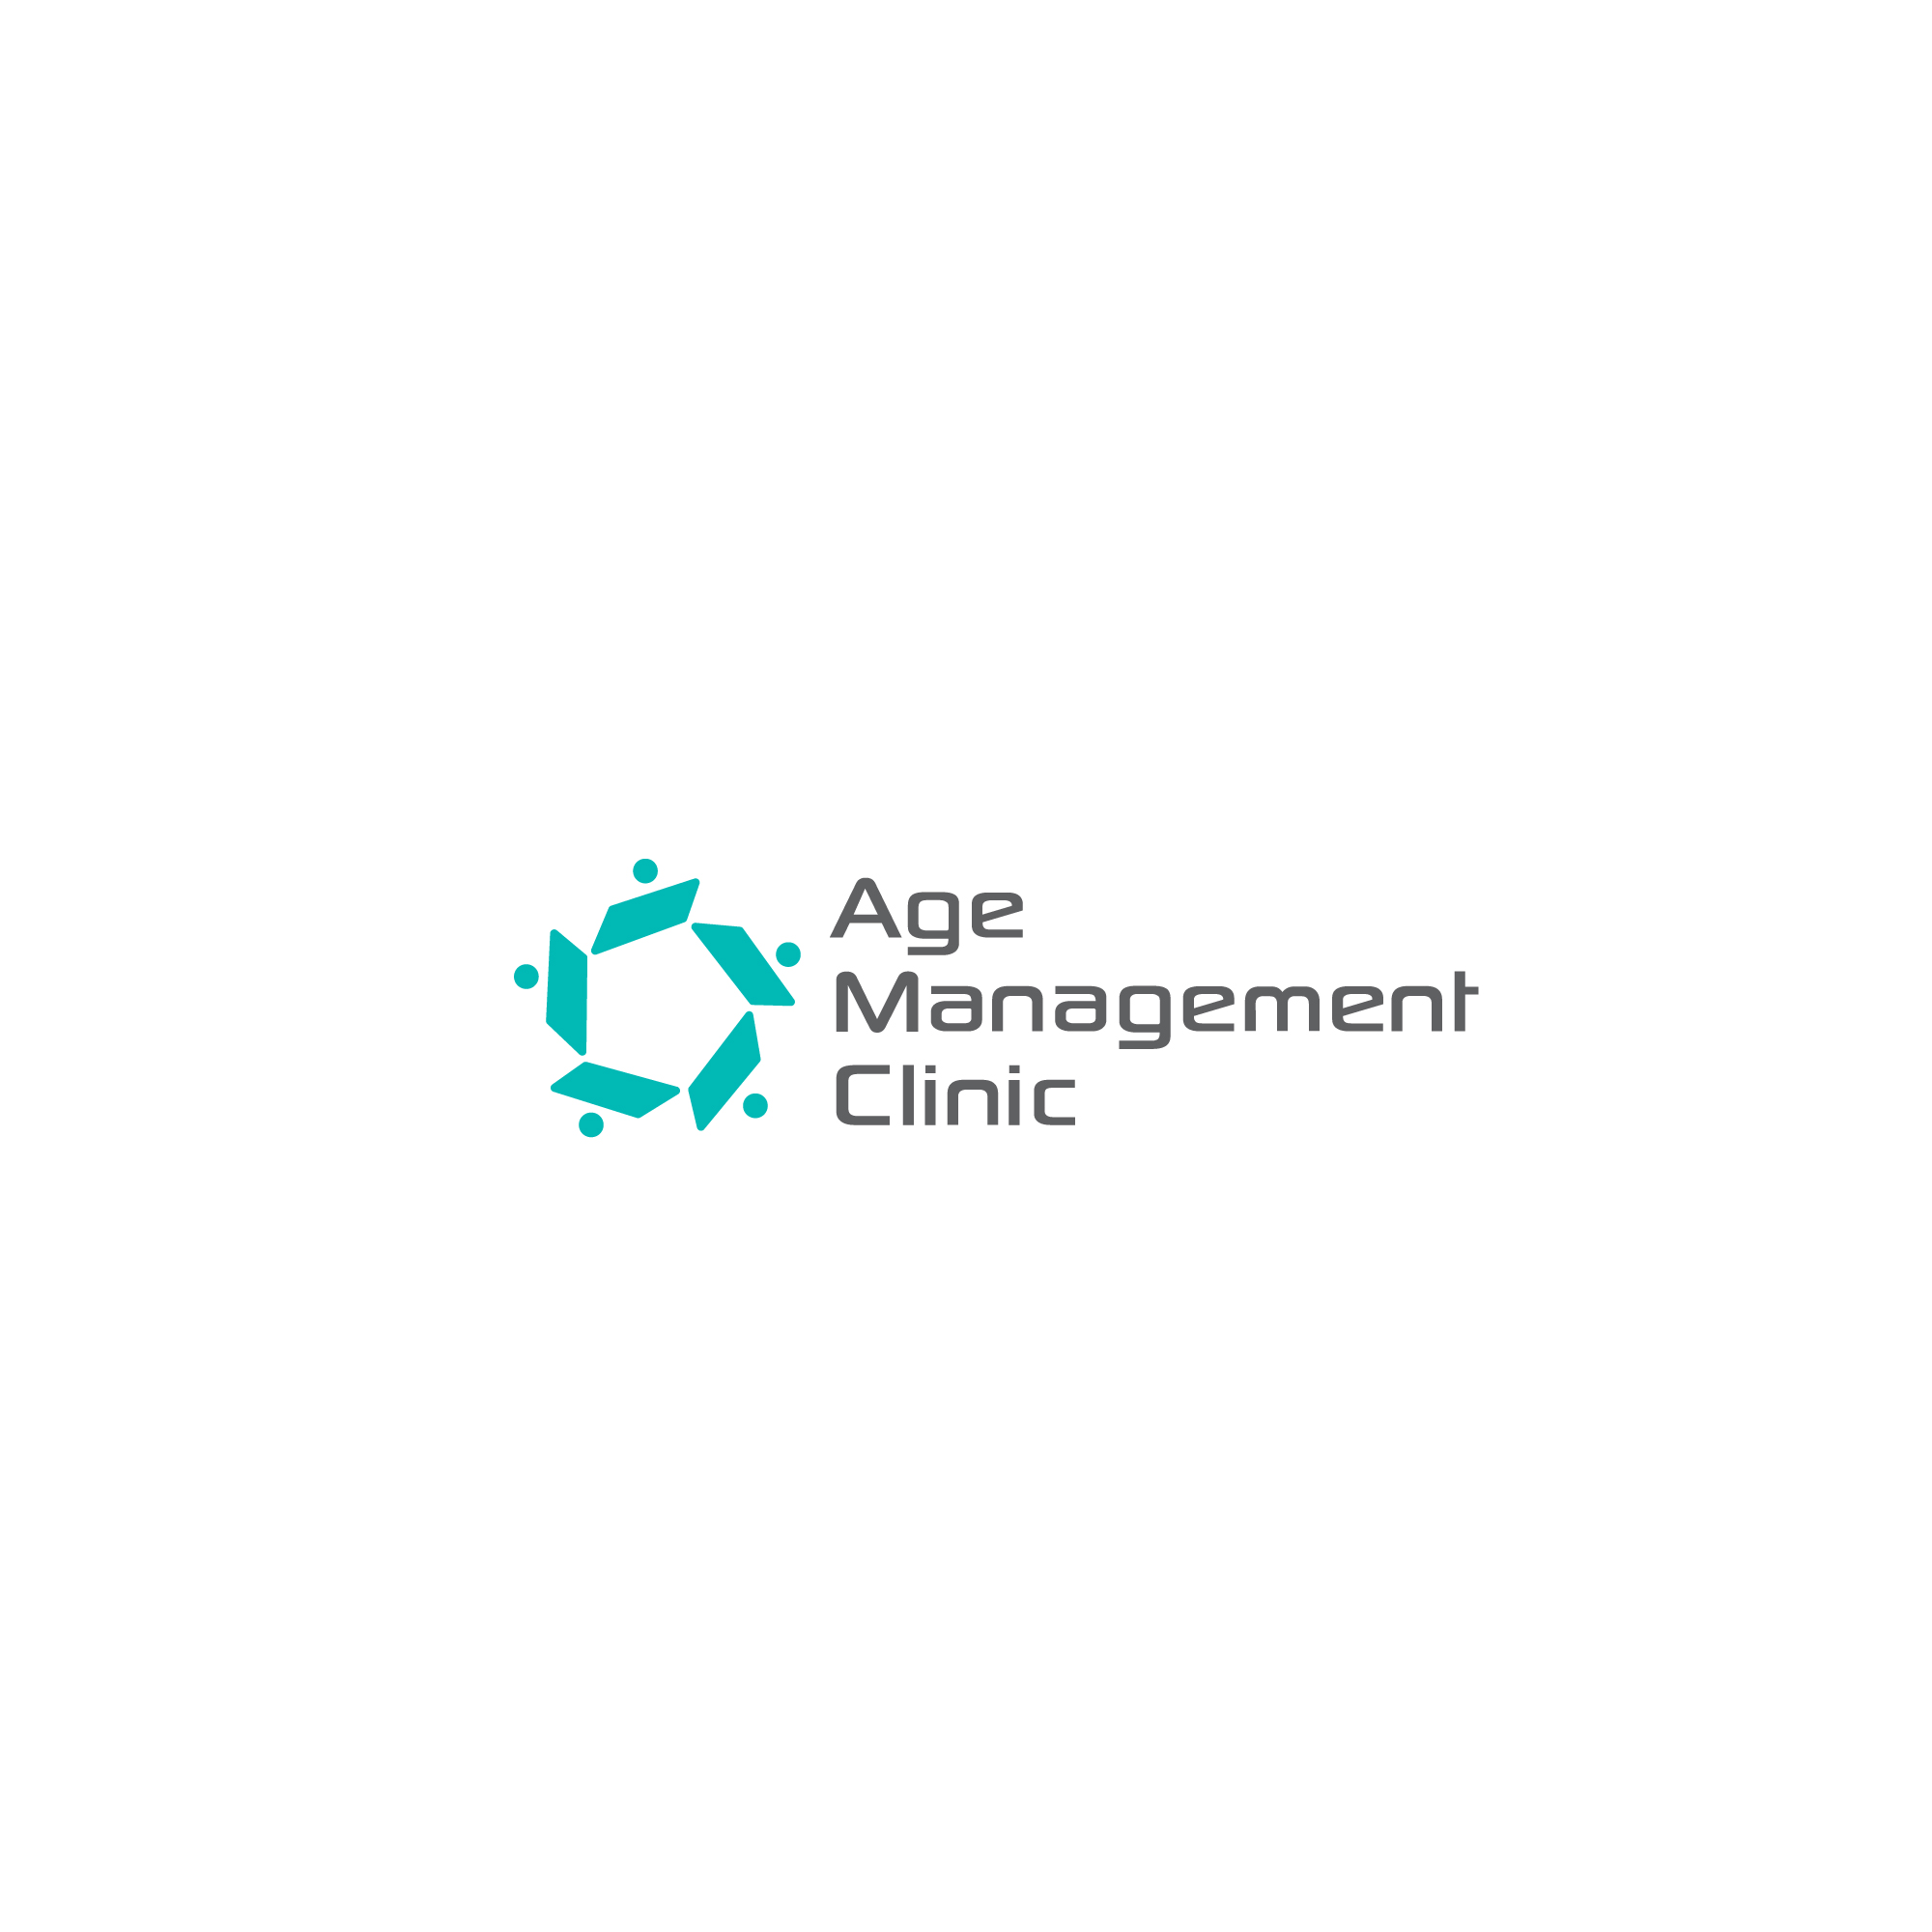 Логотип для медицинского центра (клиники)  фото f_4485b98e71d4f13c.jpg